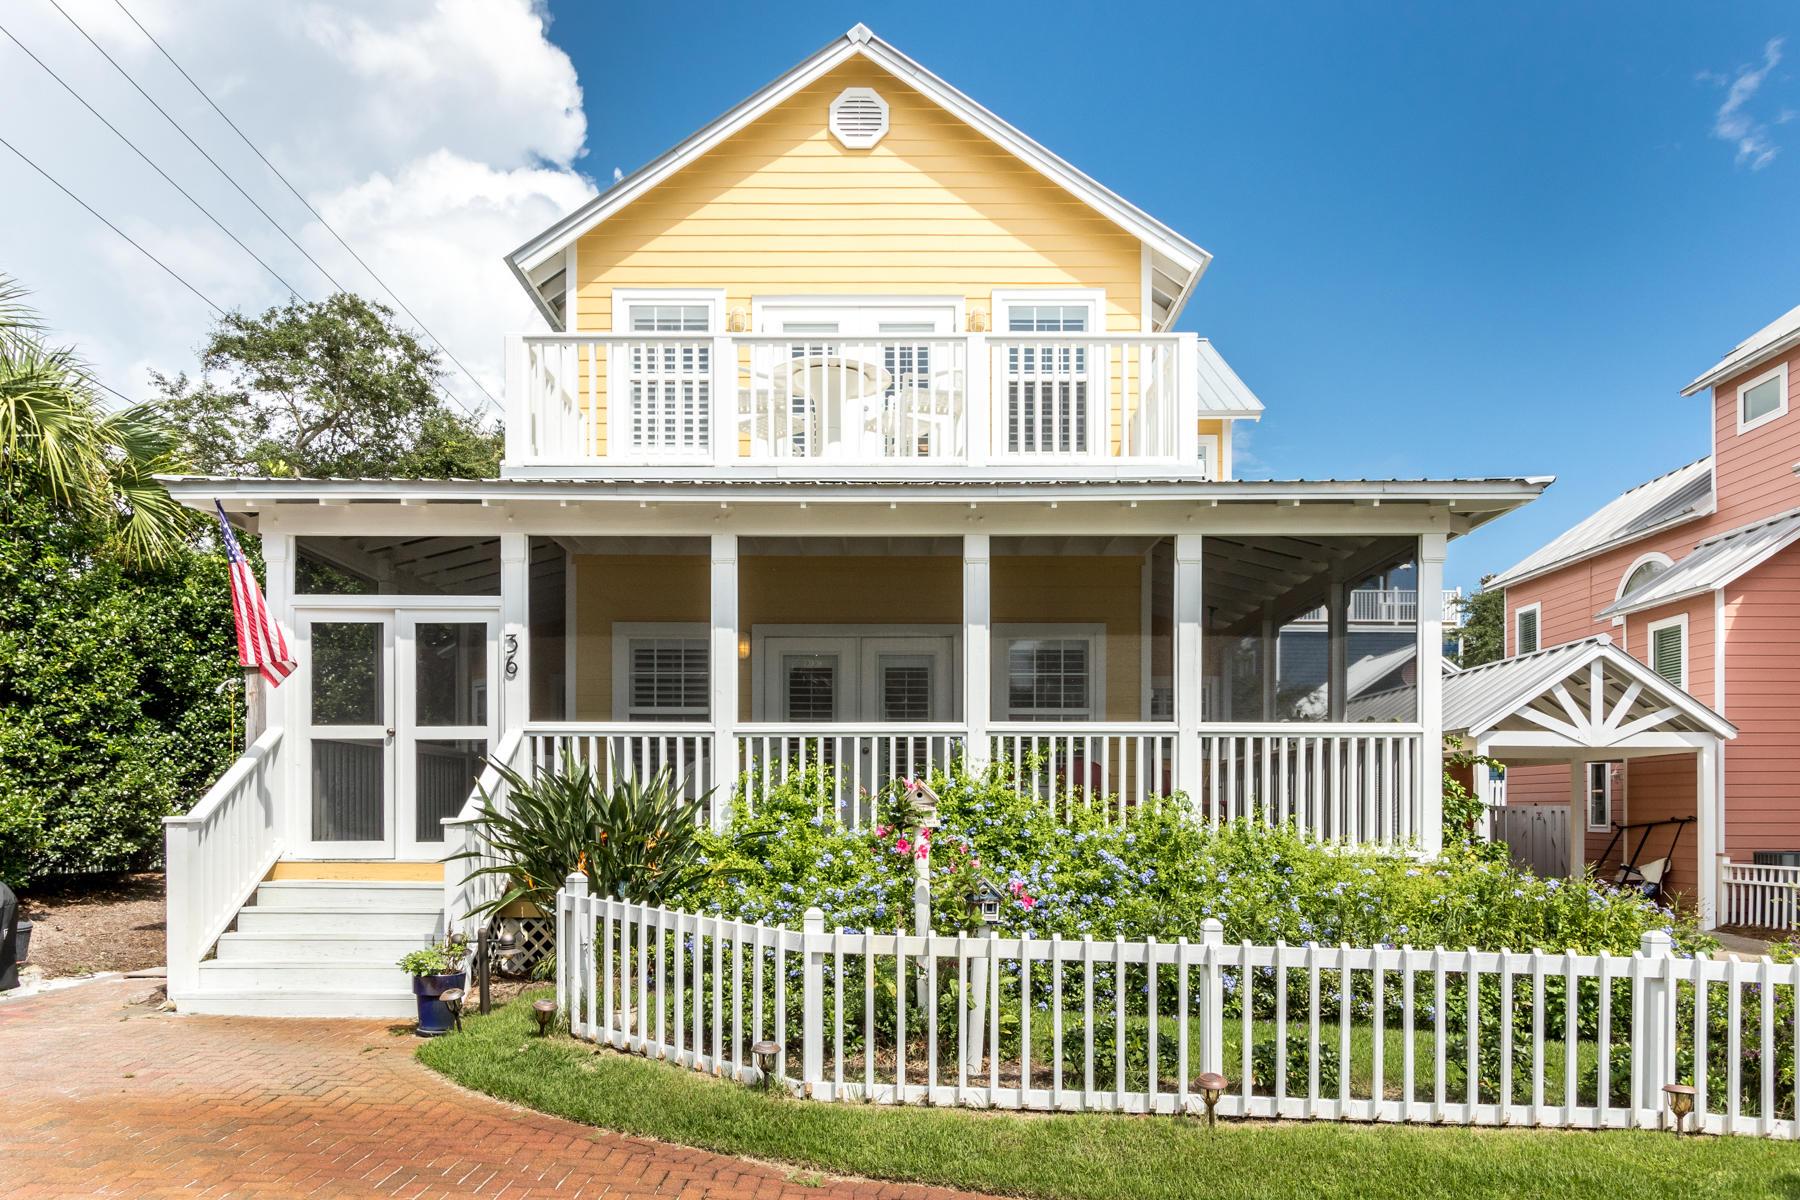 Photo of home for sale at 36 Sundown, Santa Rosa Beach FL